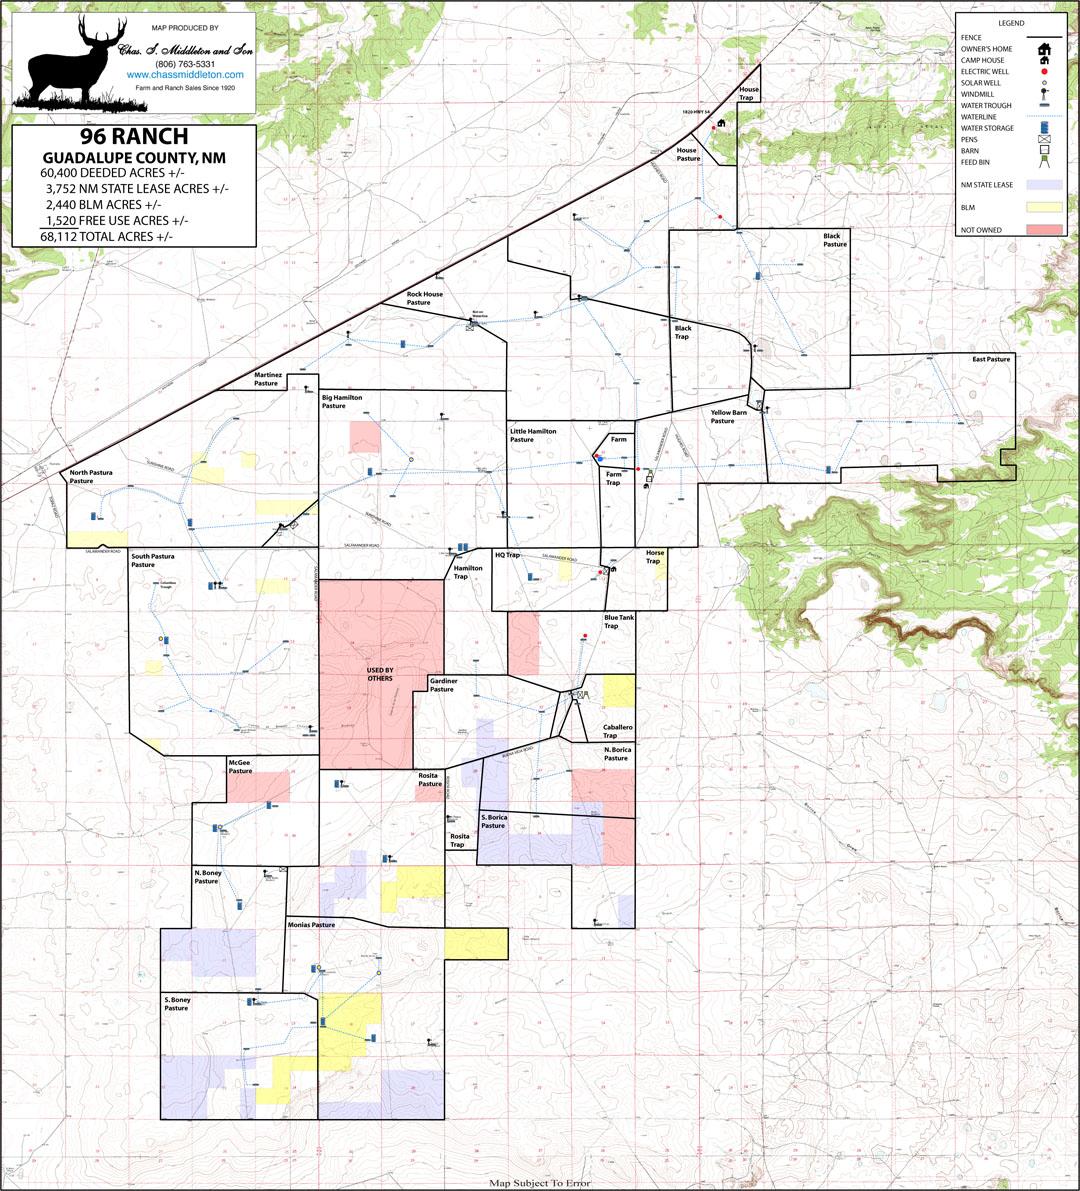 New mexico guadalupe county santa rosa - 96 Ranch Topo Map Jpg